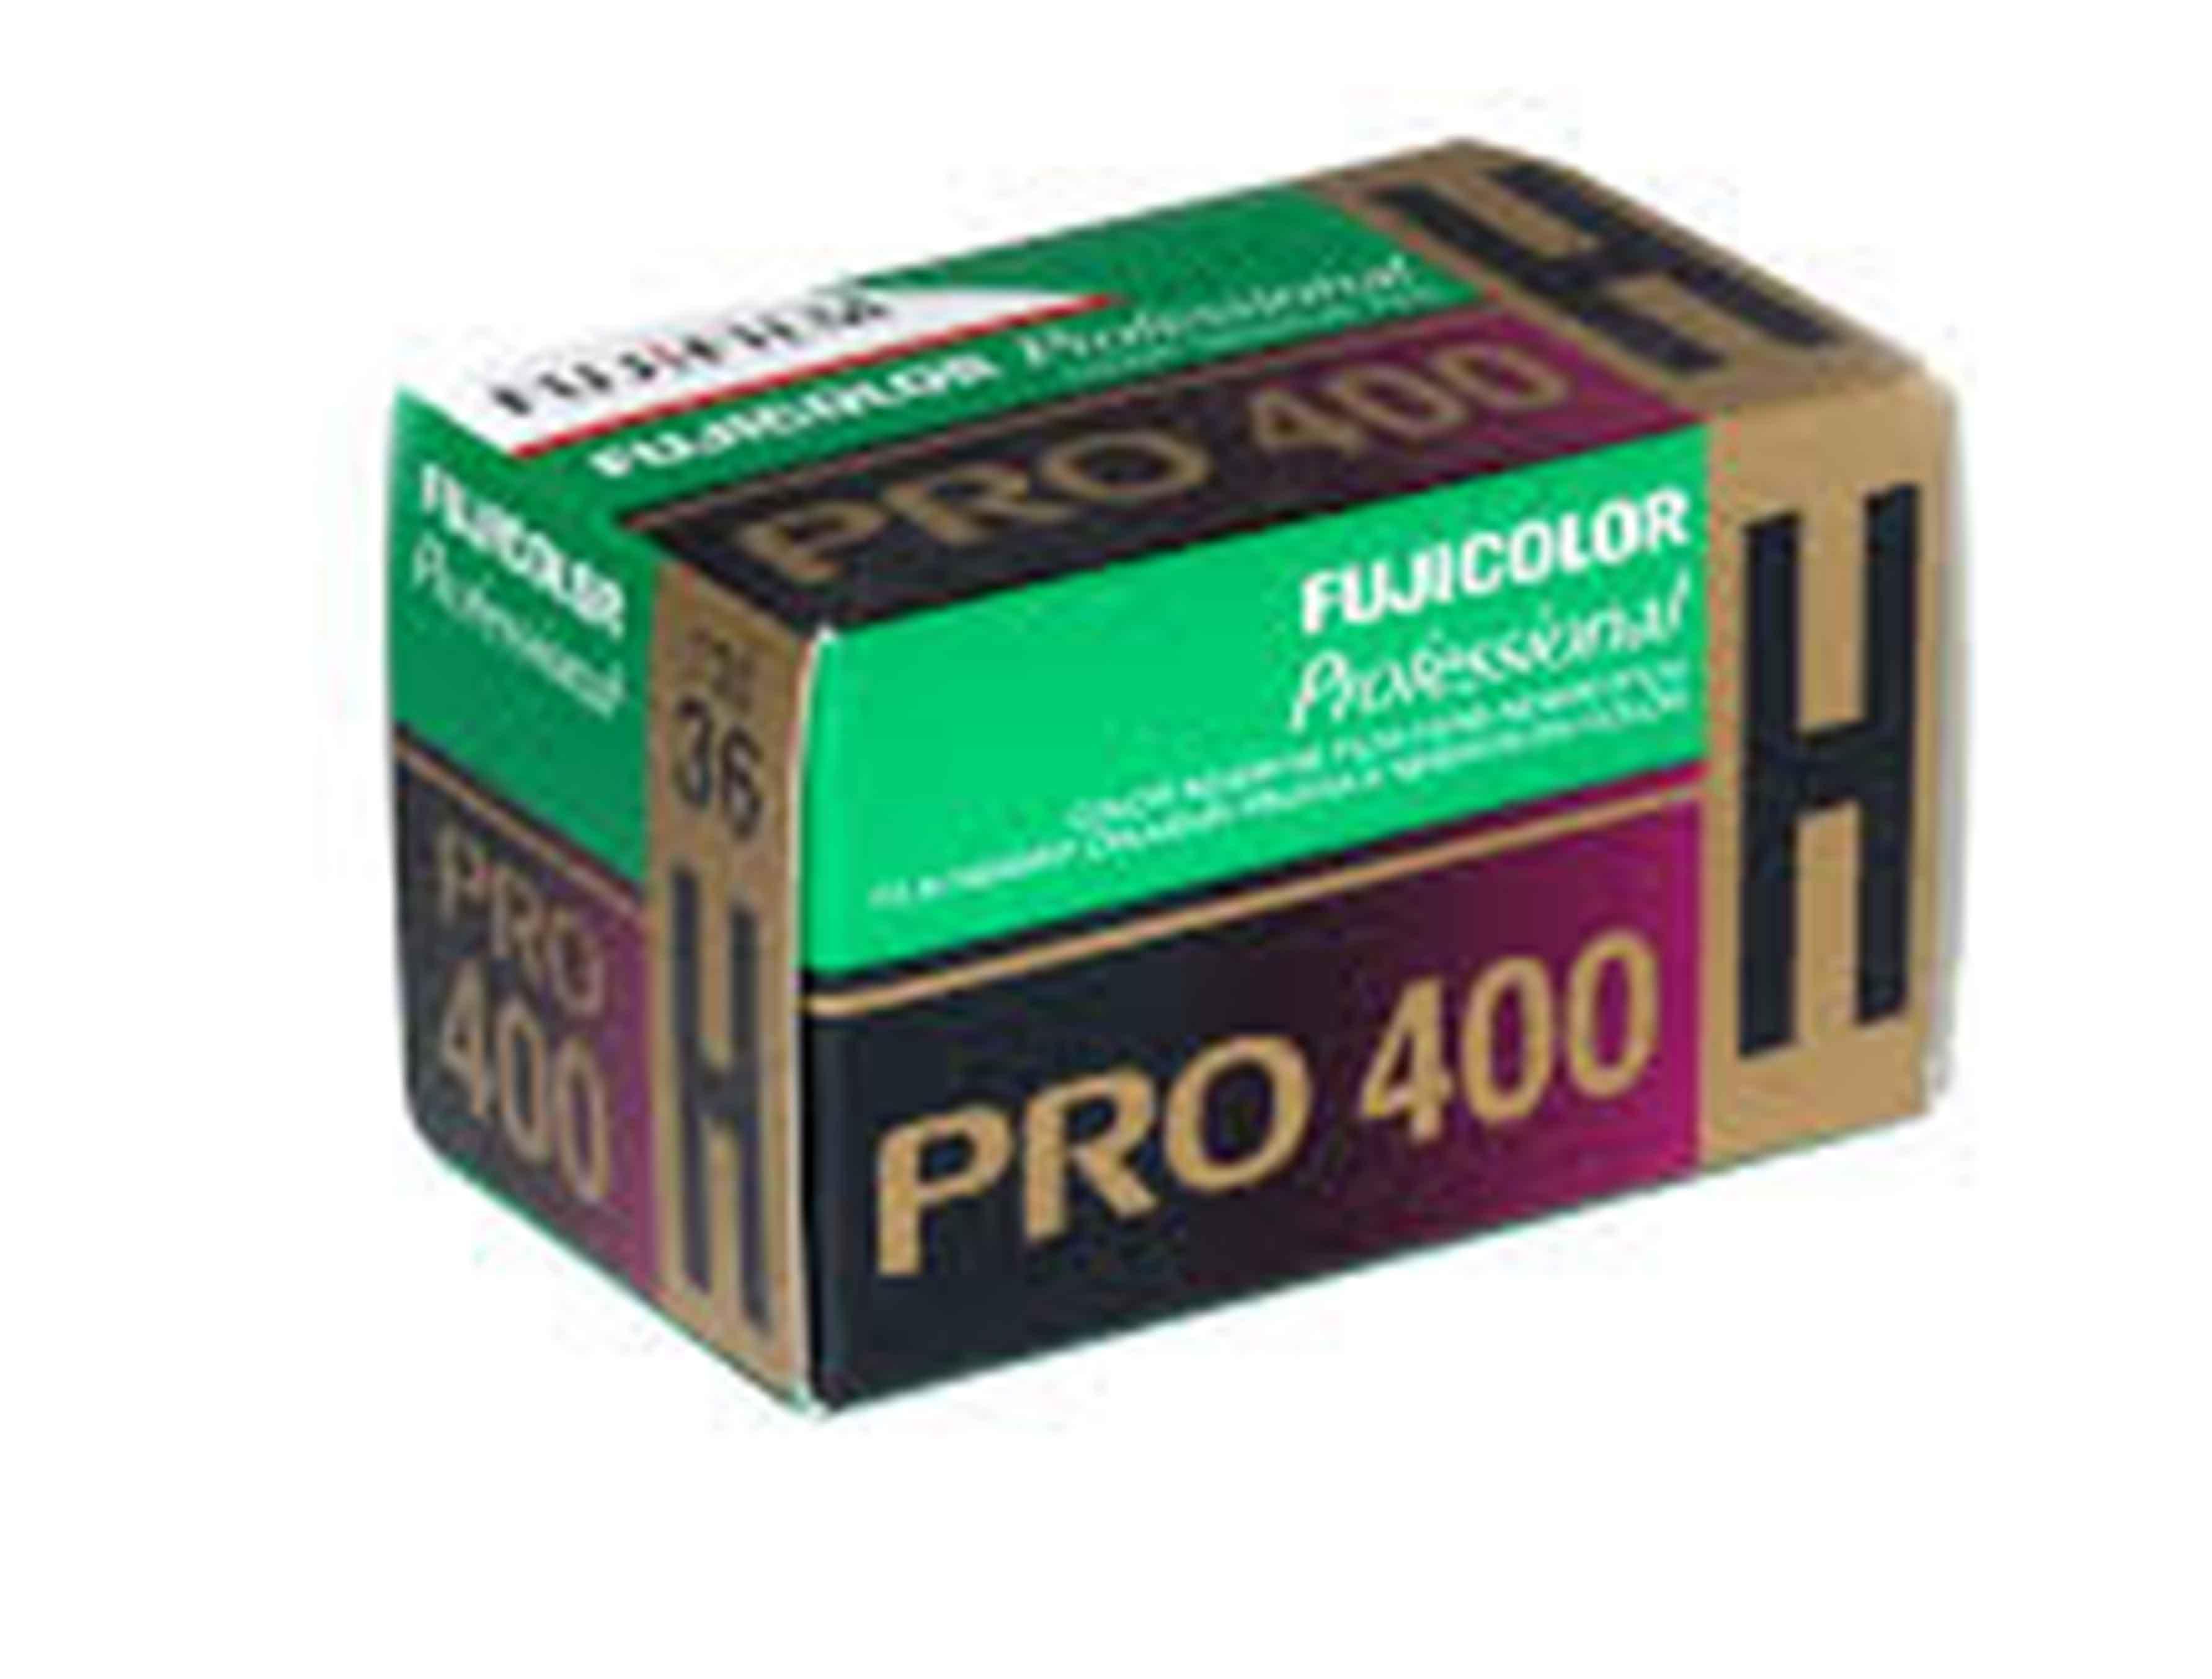 Fujifilm Pro 400H 135/36